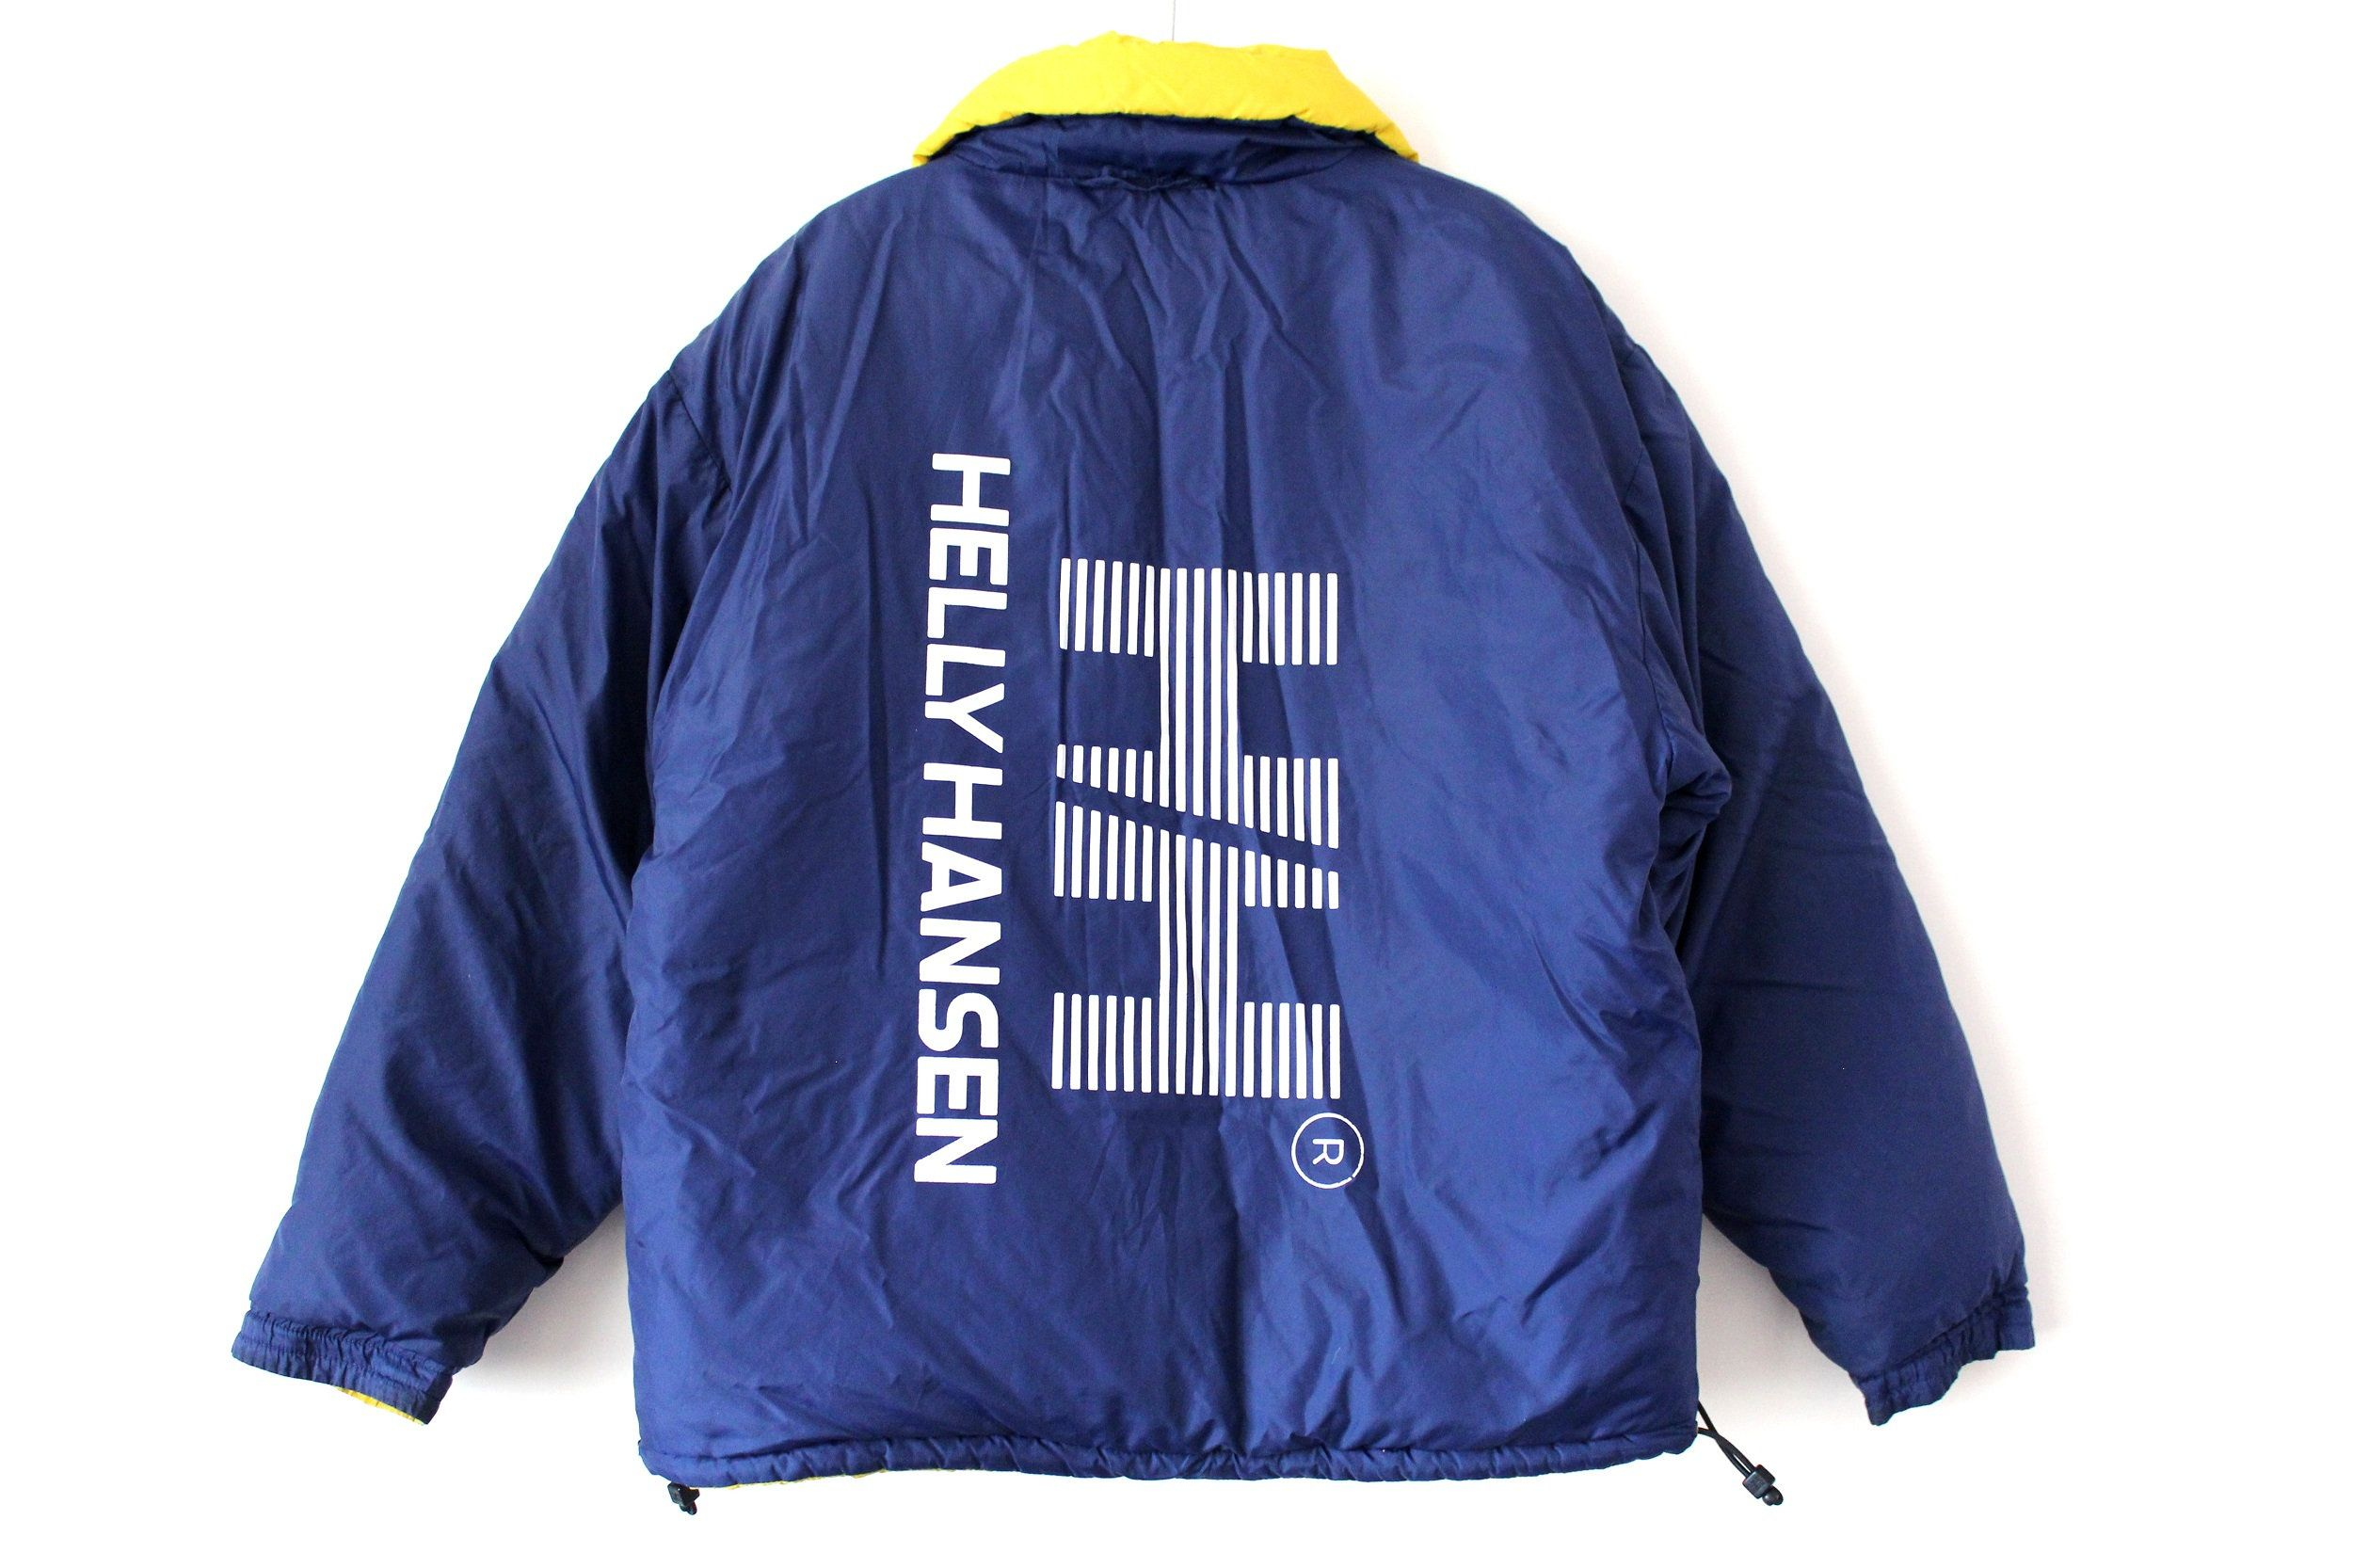 Vintage Helly Hansen Down Jacket Reversible Big Logo Blue Yellow Puffer Jacket Size L Yellow Puffer Jacket Down Jacket Jackets [ 1666 x 2500 Pixel ]